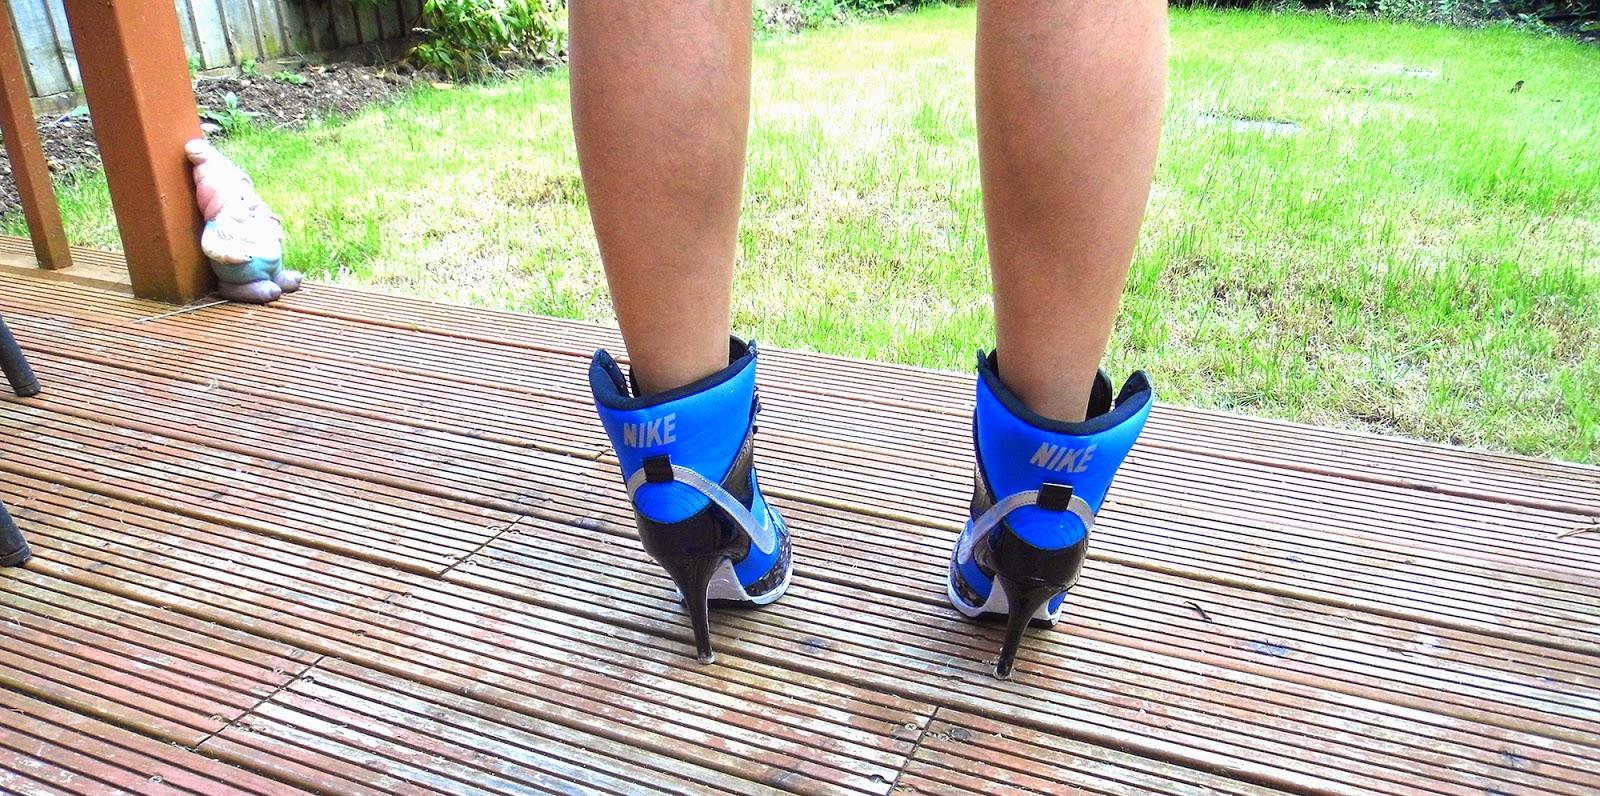 Nike Stiletto Hi-Tops